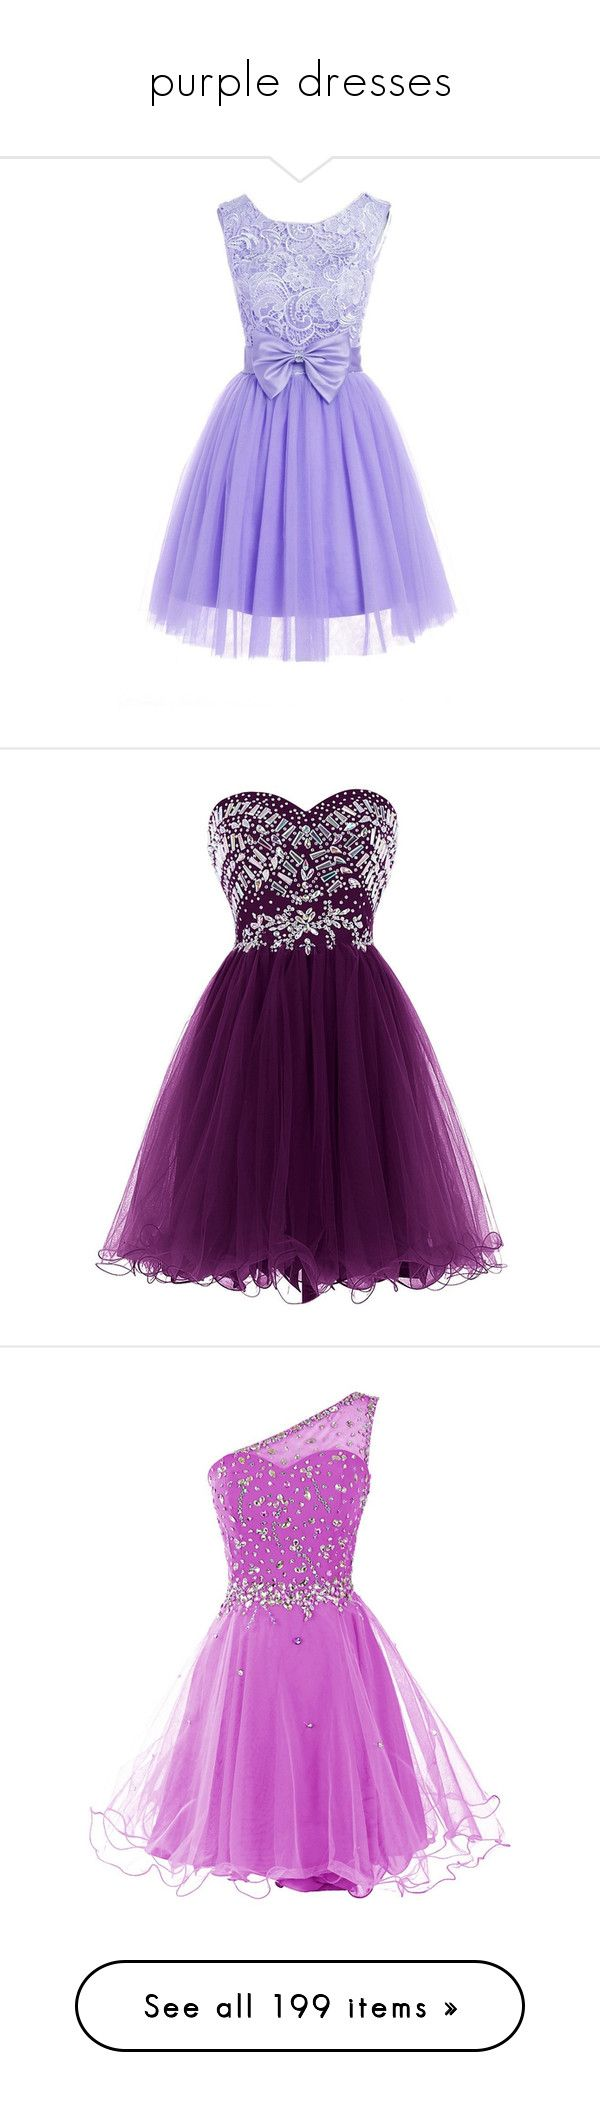 """purple dresses"" by megsjessd99 ❤ liked on Polyvore featuring dresses, bridesmaid dresses, purple homecoming dresses, short bridesmaid dresses, lace cocktail dress, prom dresses, short dresses, sweetheart prom dresses, tulle dress and purple dress"